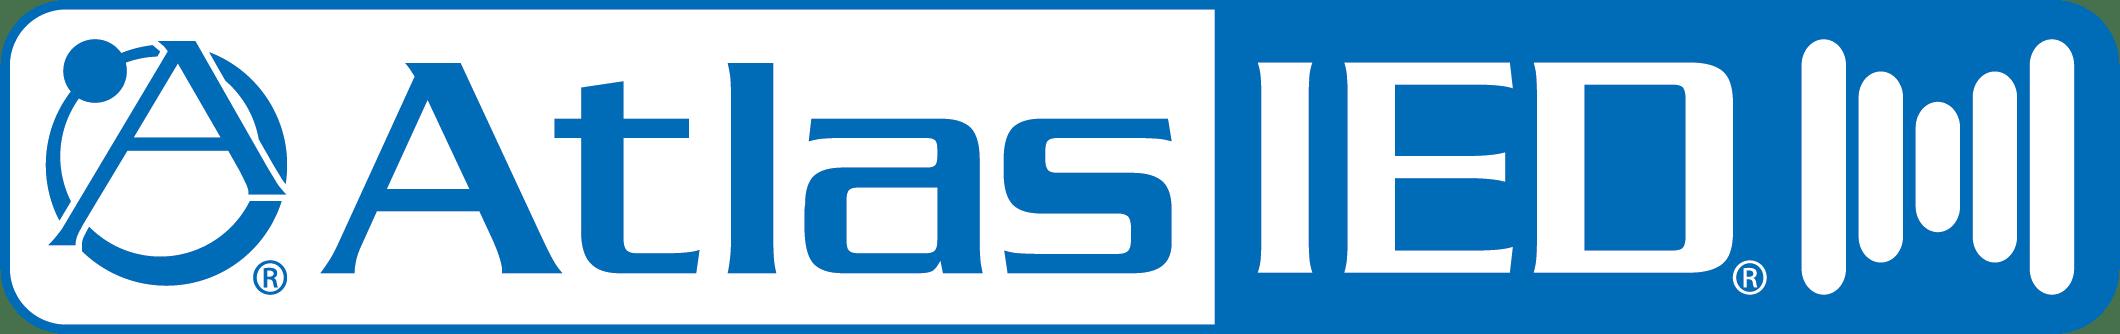 Meridian Audio company logo